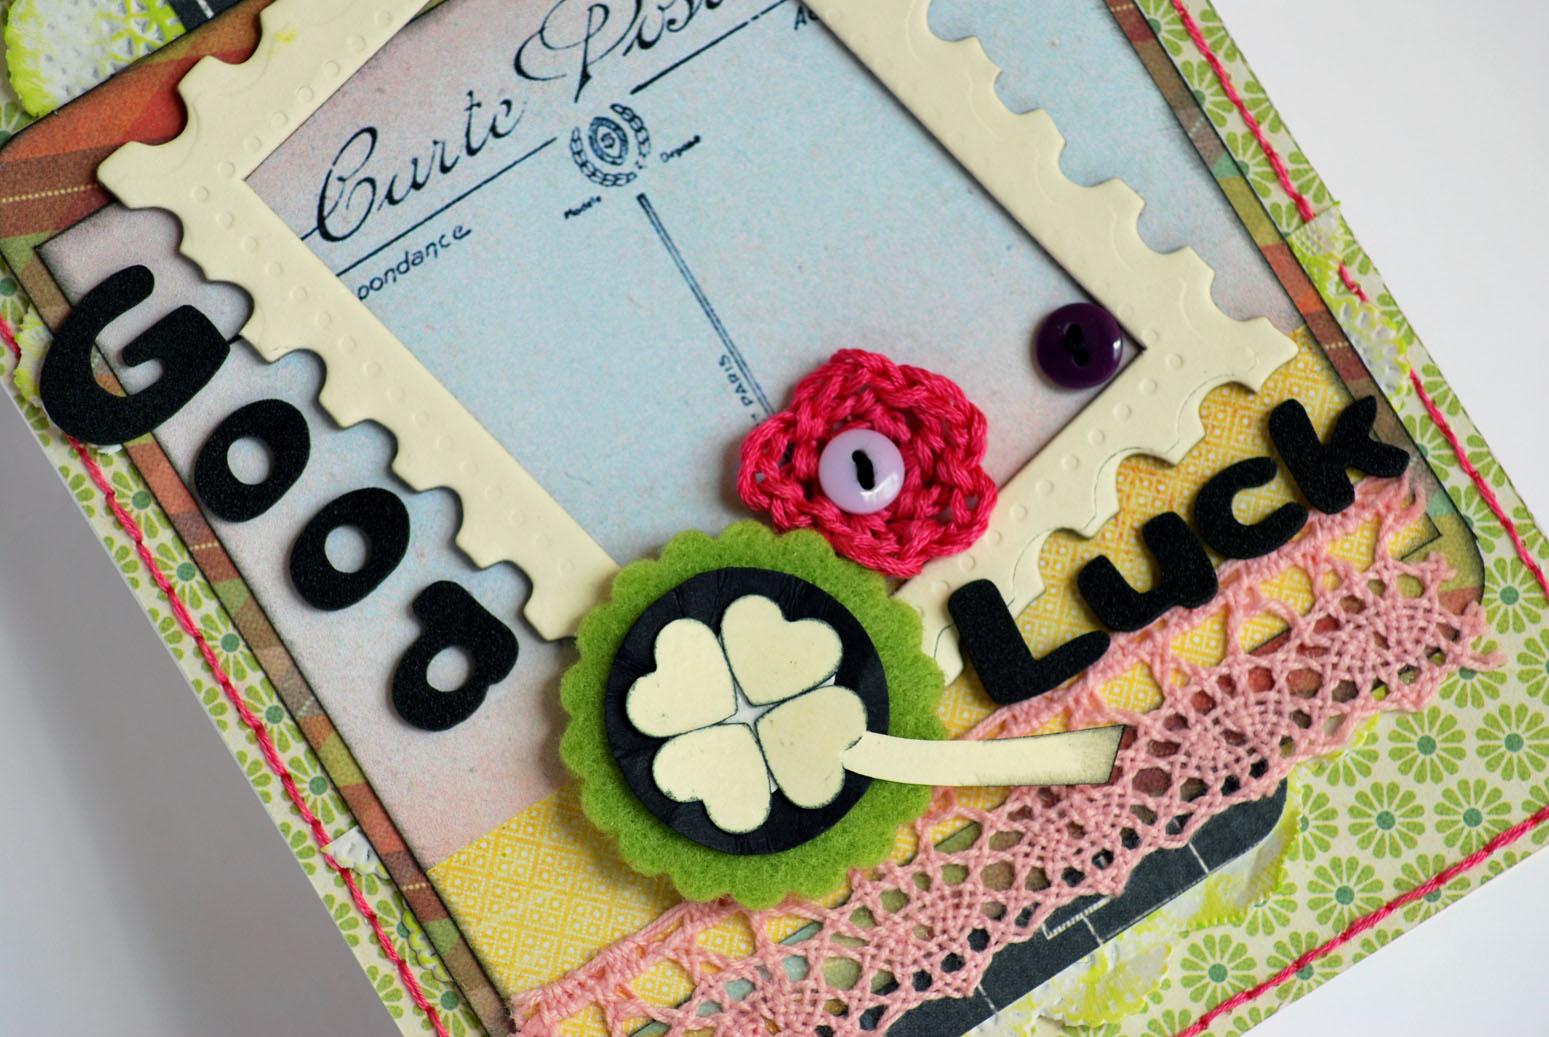 http://4.bp.blogspot.com/-xsGdYdMGVQw/T2cacQ-WNRI/AAAAAAAAA2I/hRBQYA0j6xA/s1600/Good+Luck+detail.jpg